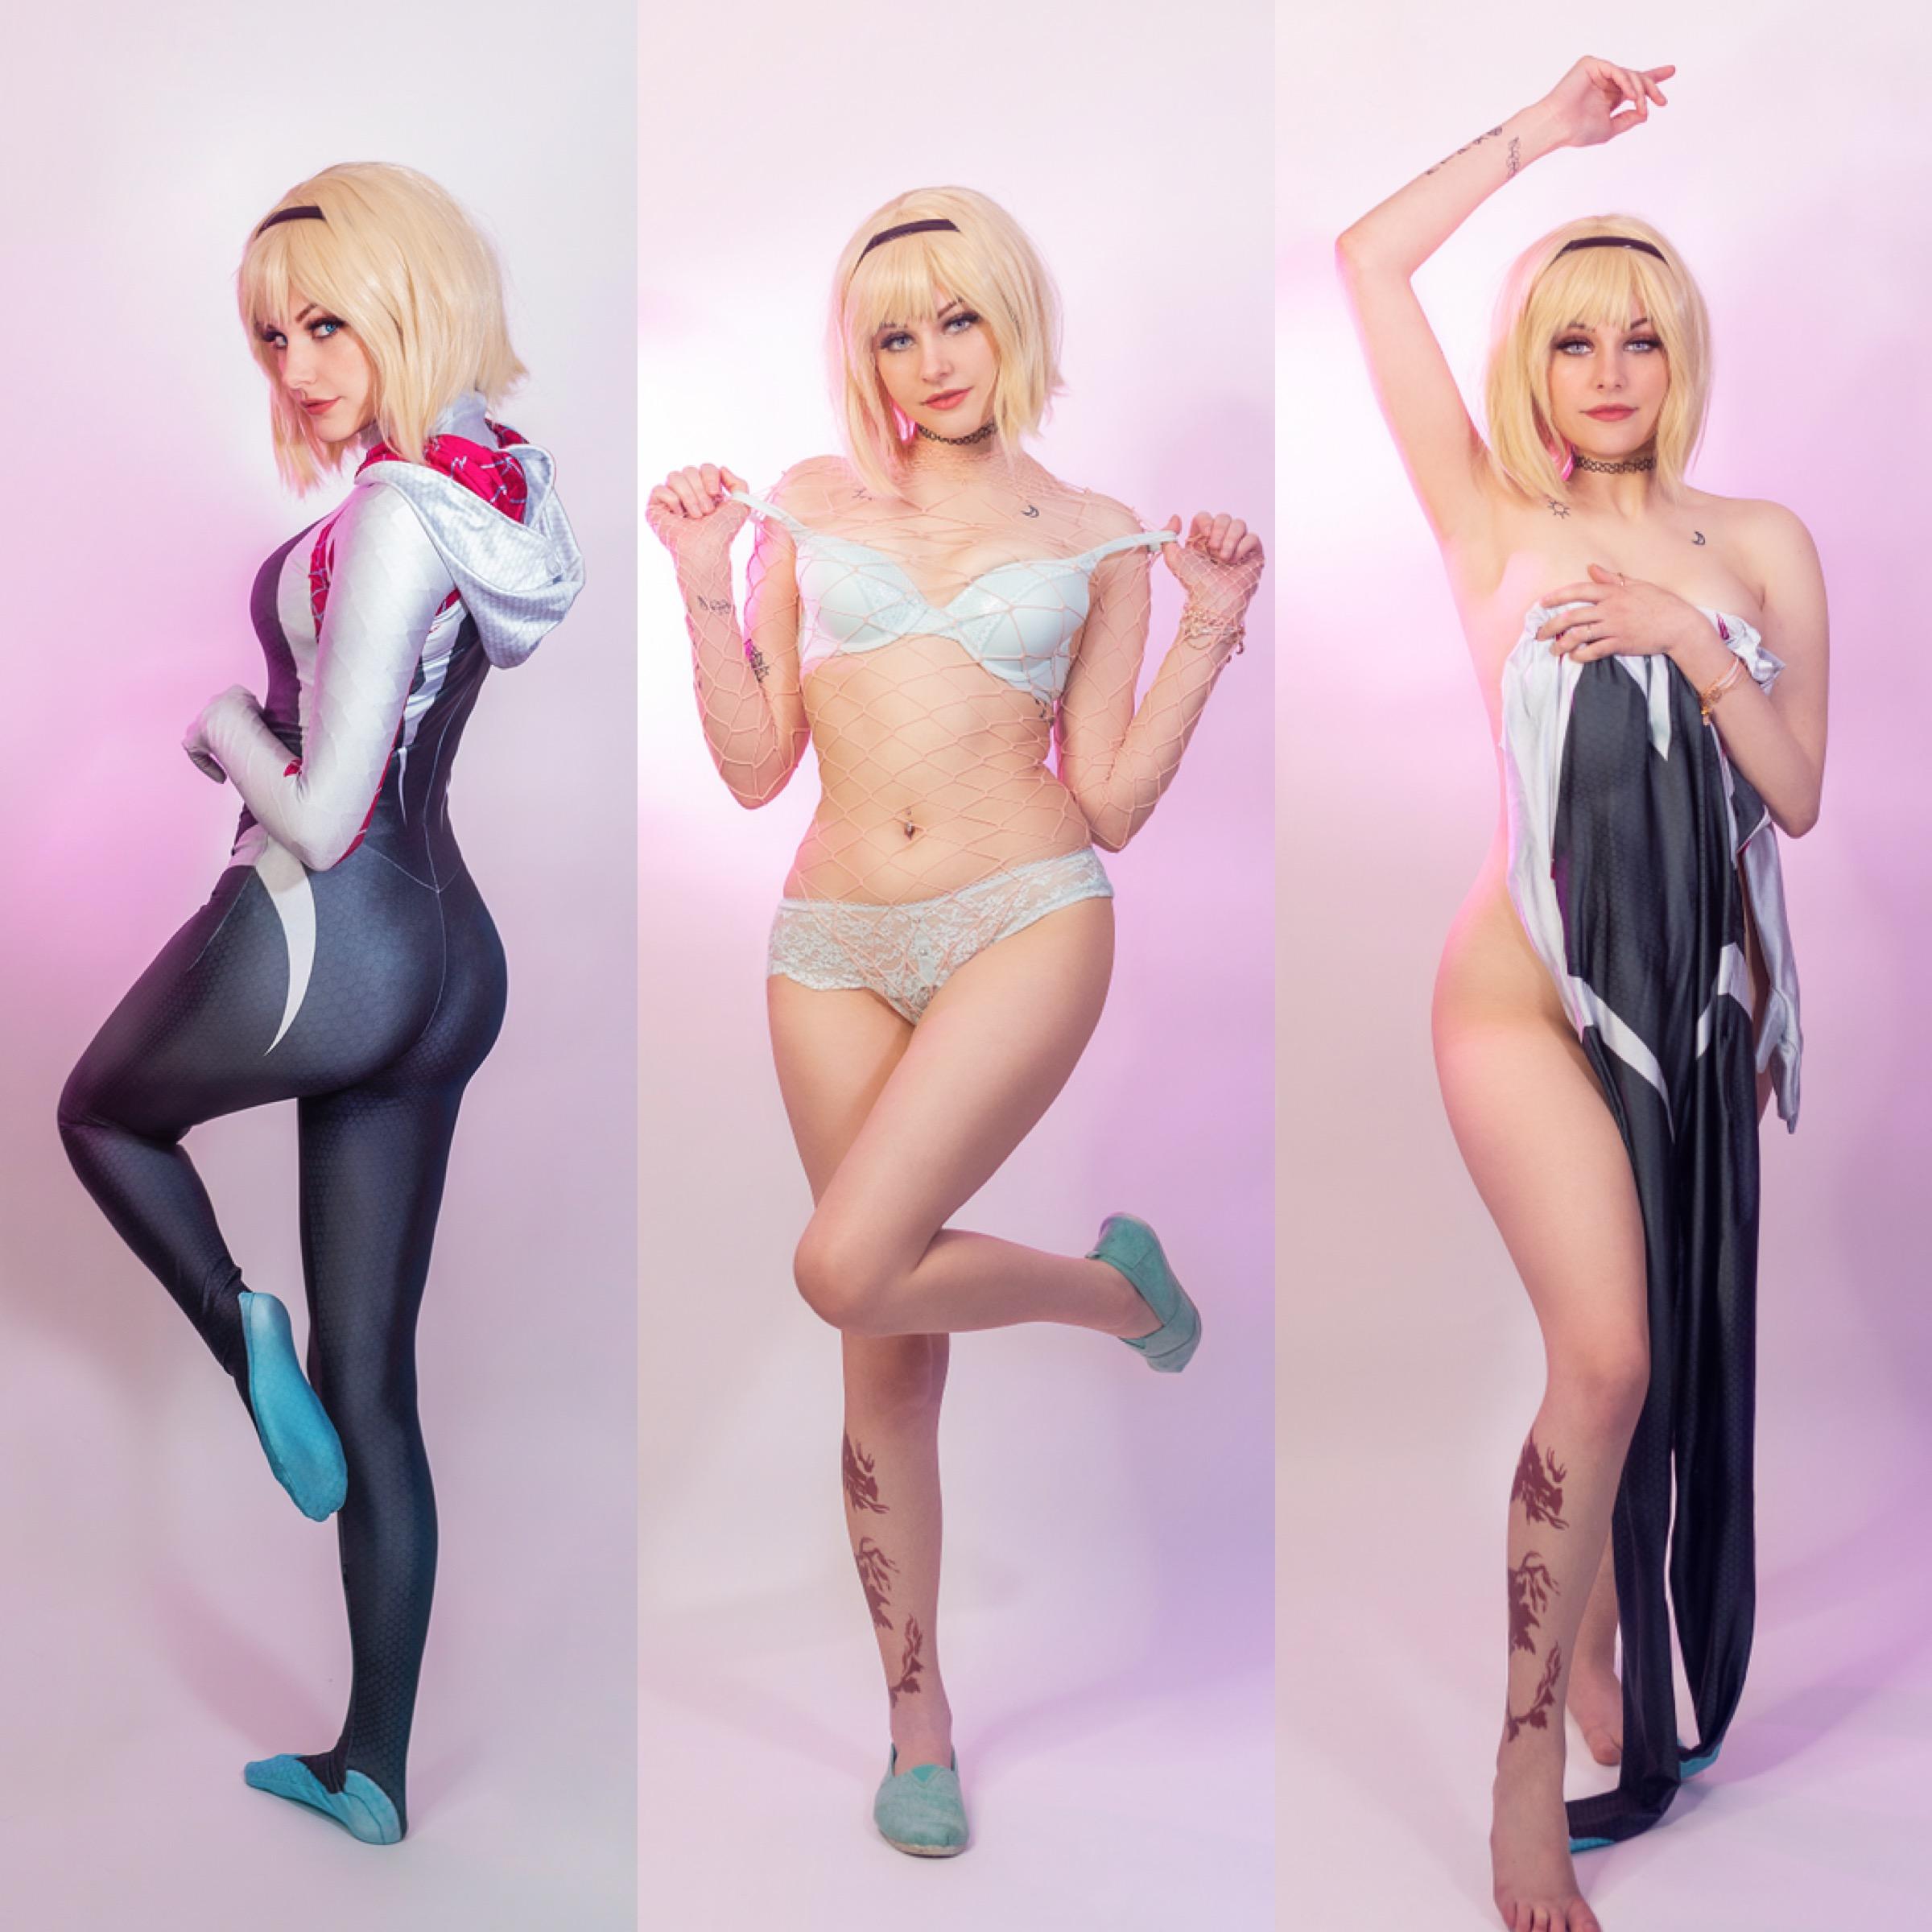 Porn gwen stacy Gwen Stacy